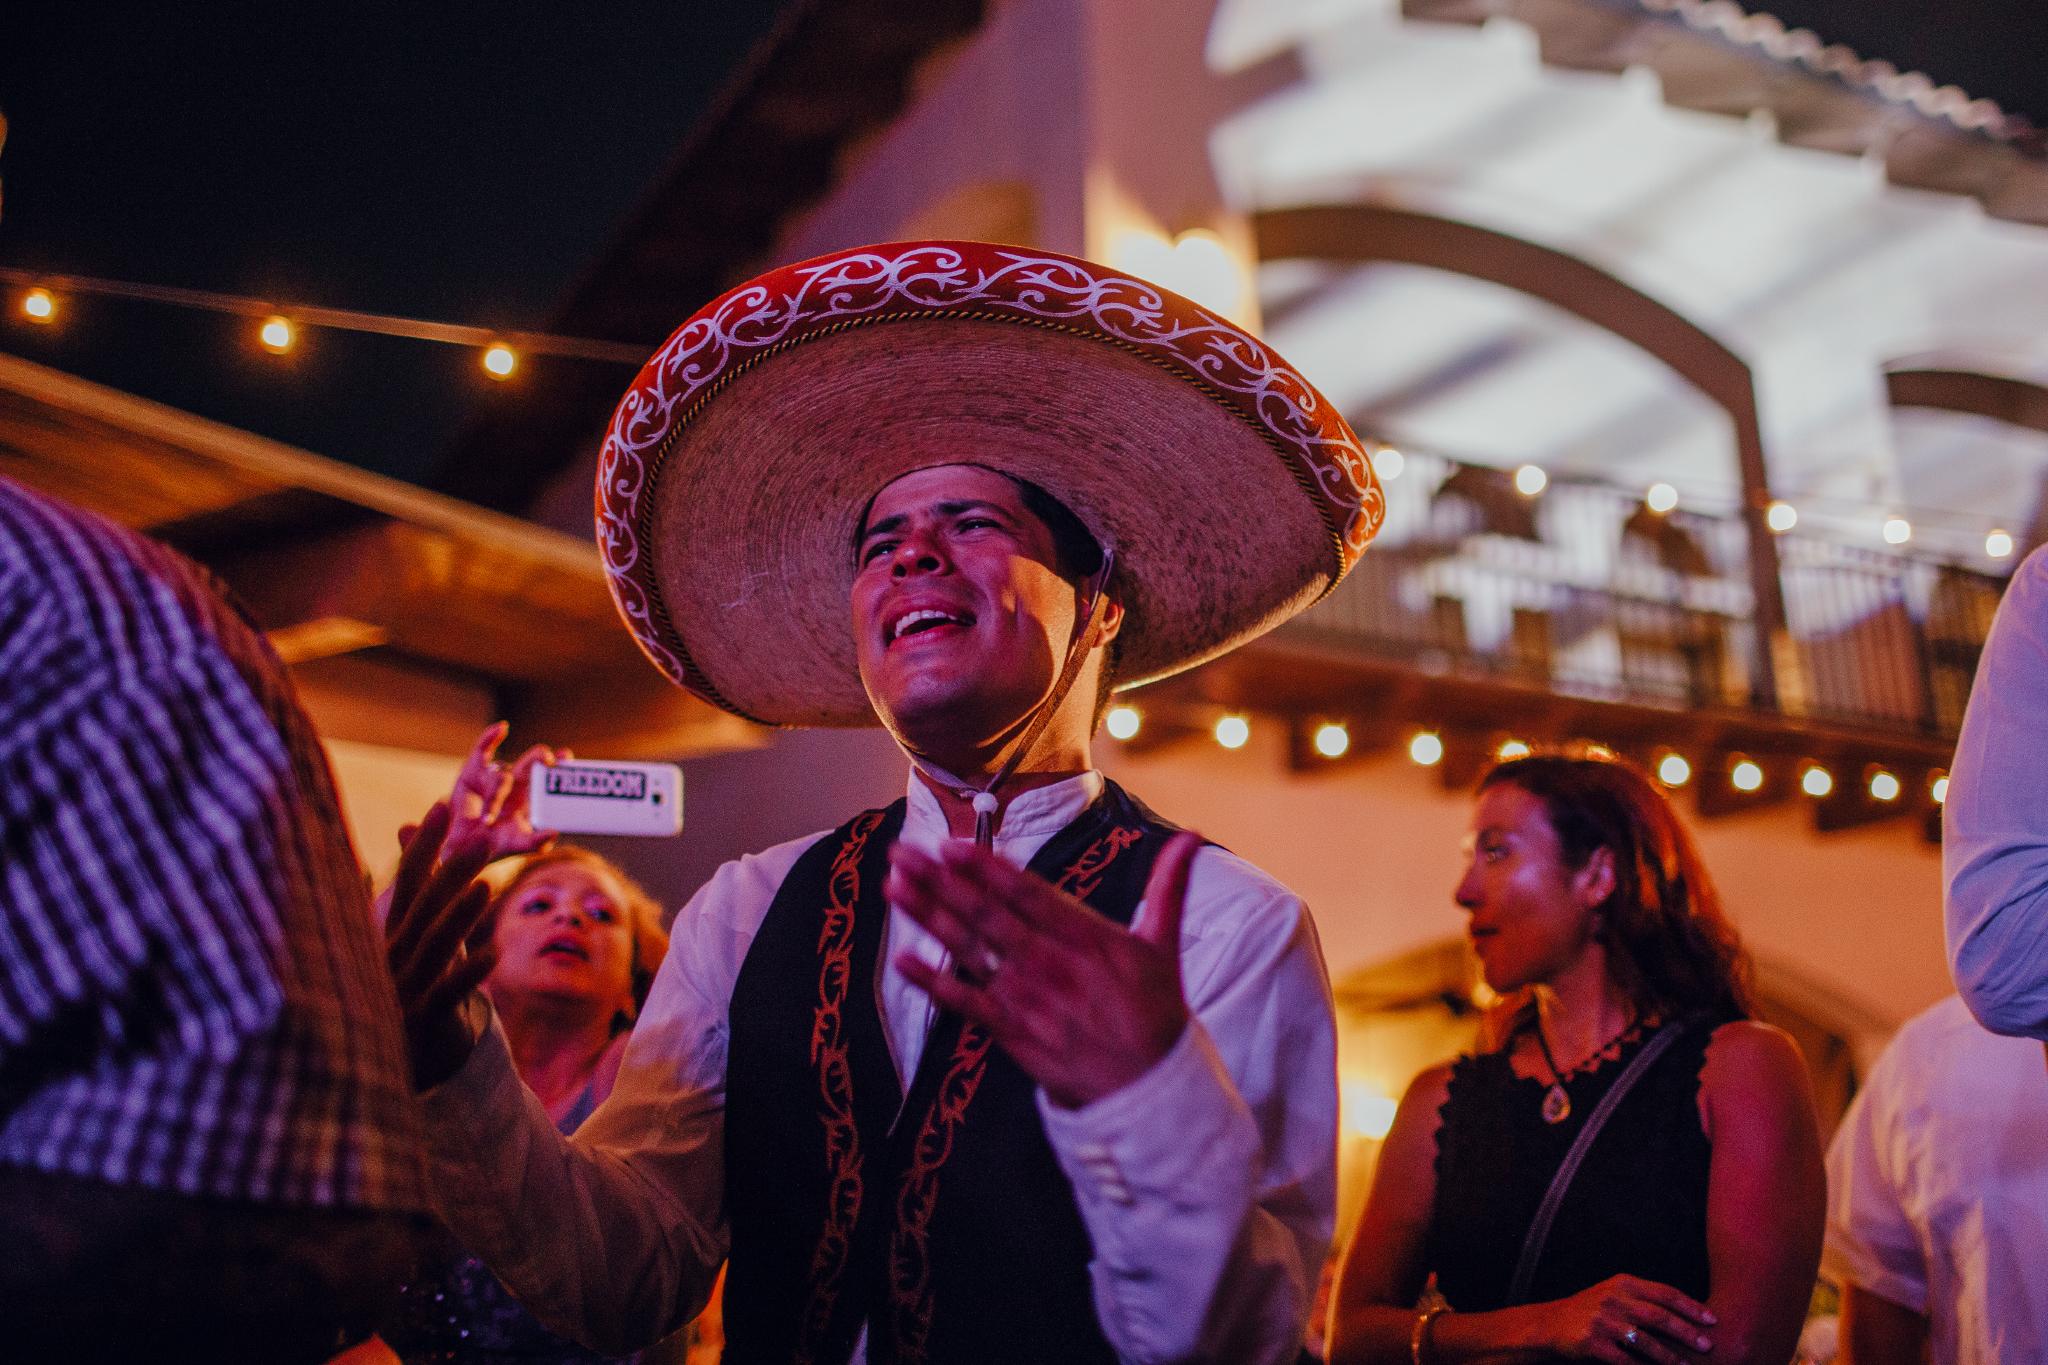 San Diego Wedding Photographer | groom enjoying her bride's performance